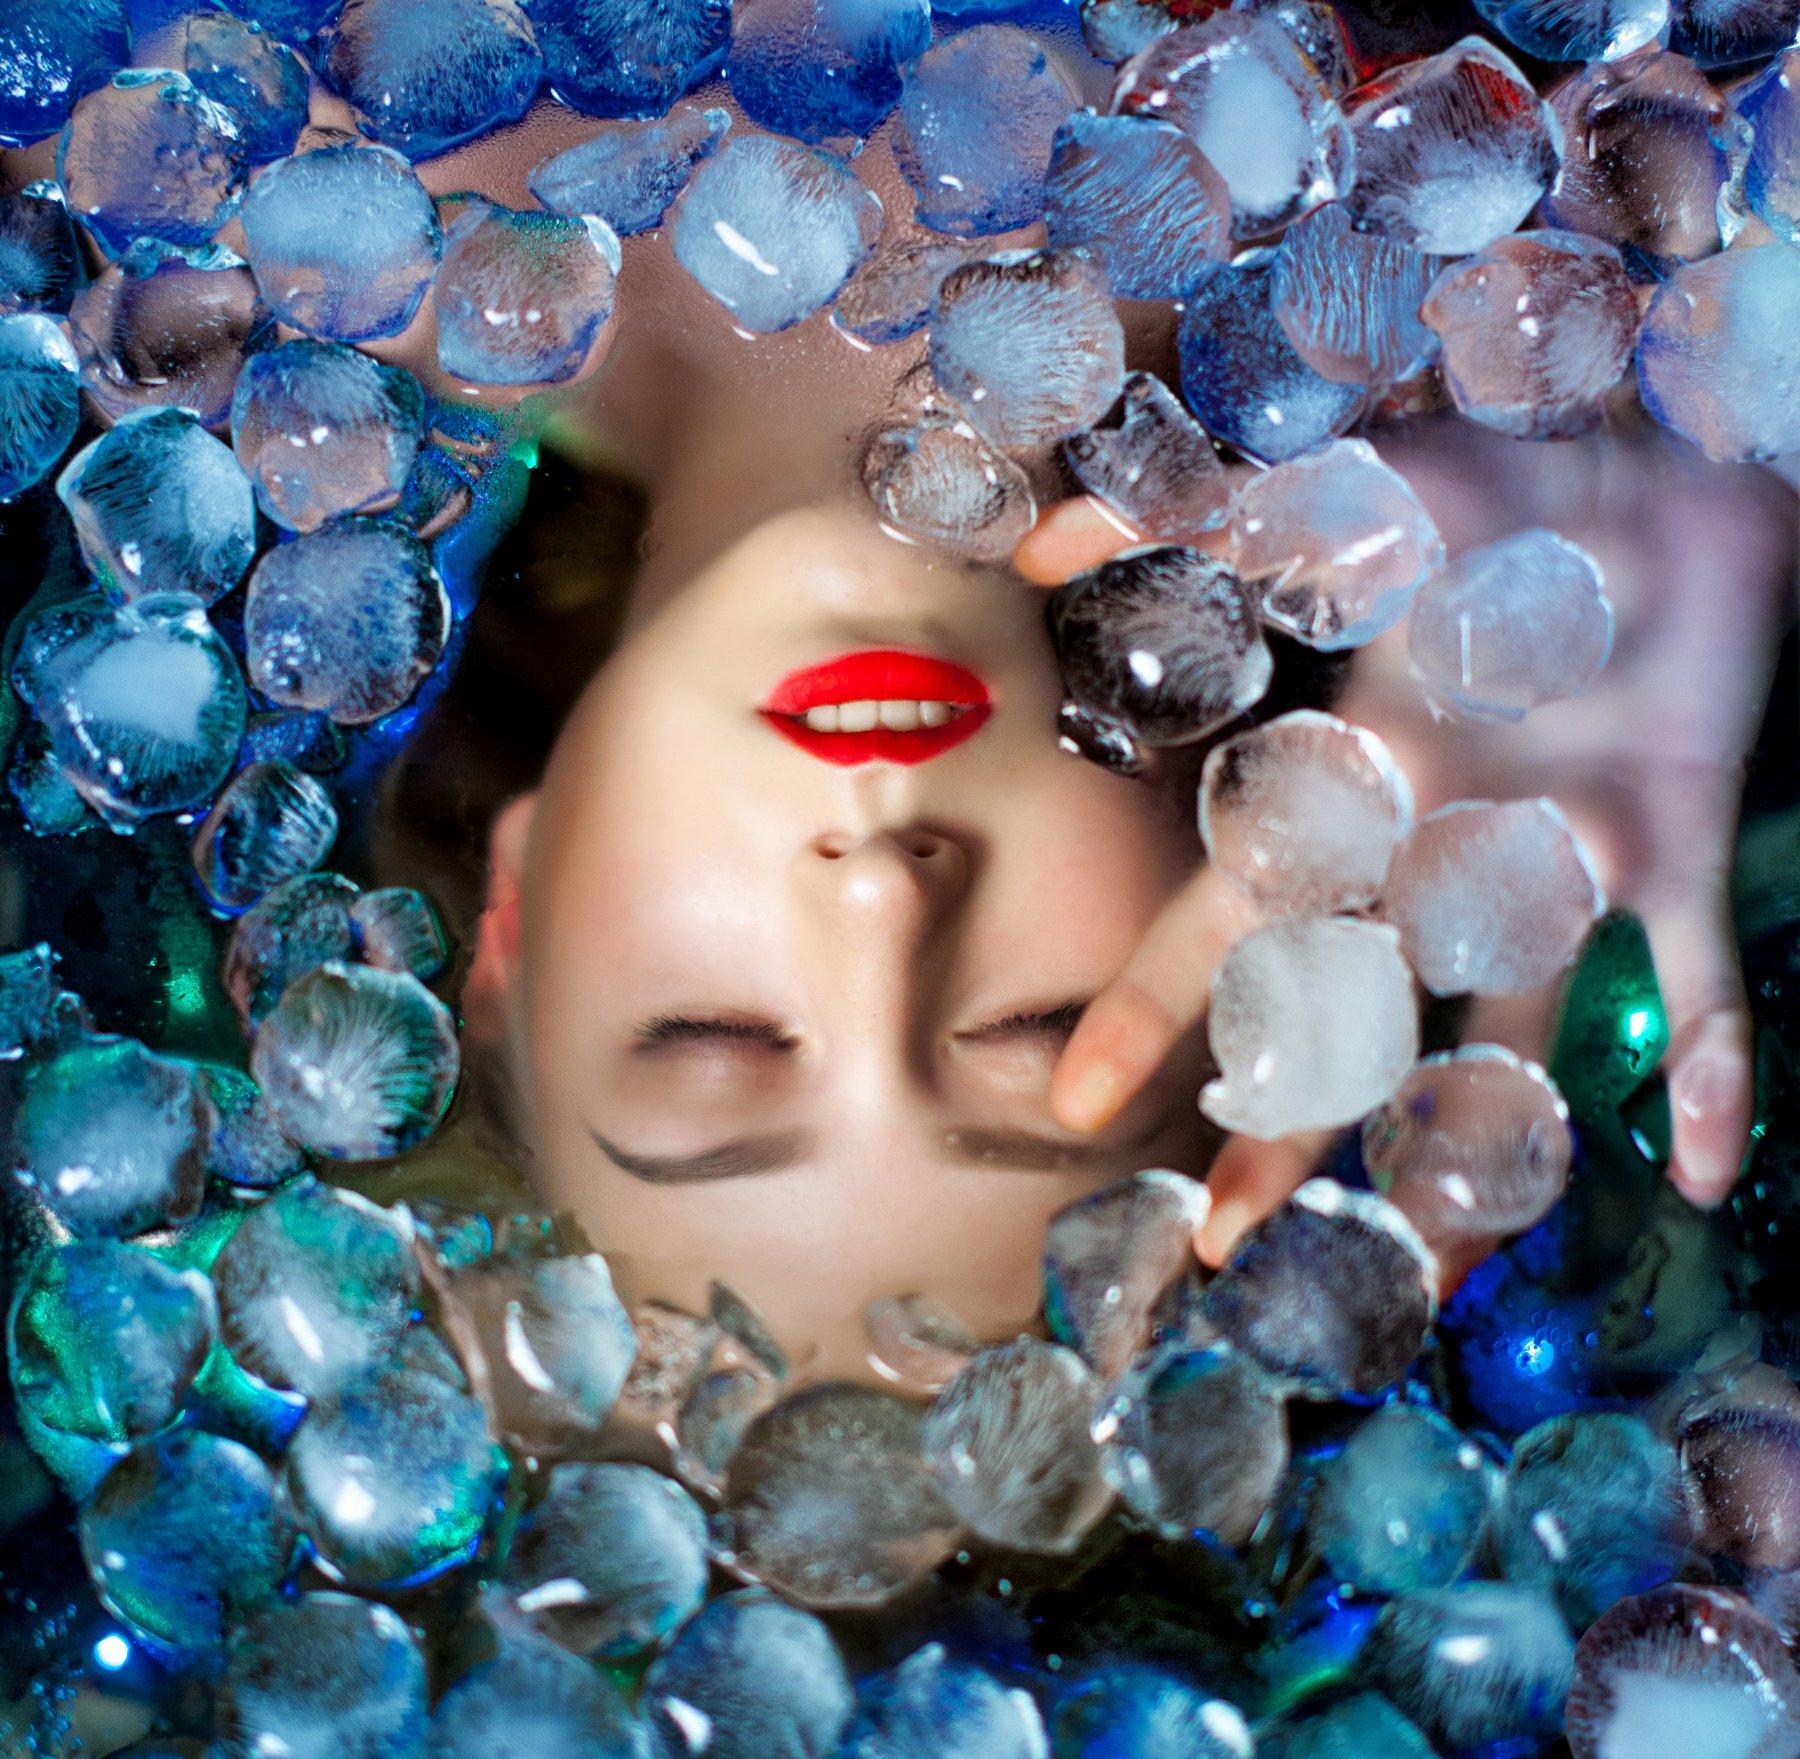 ice, winter, cold, water, underwater, art, portrait, girl, beautiful, color, blue, red, lake, mermaid, fairy tale,, Фомина Екатерина